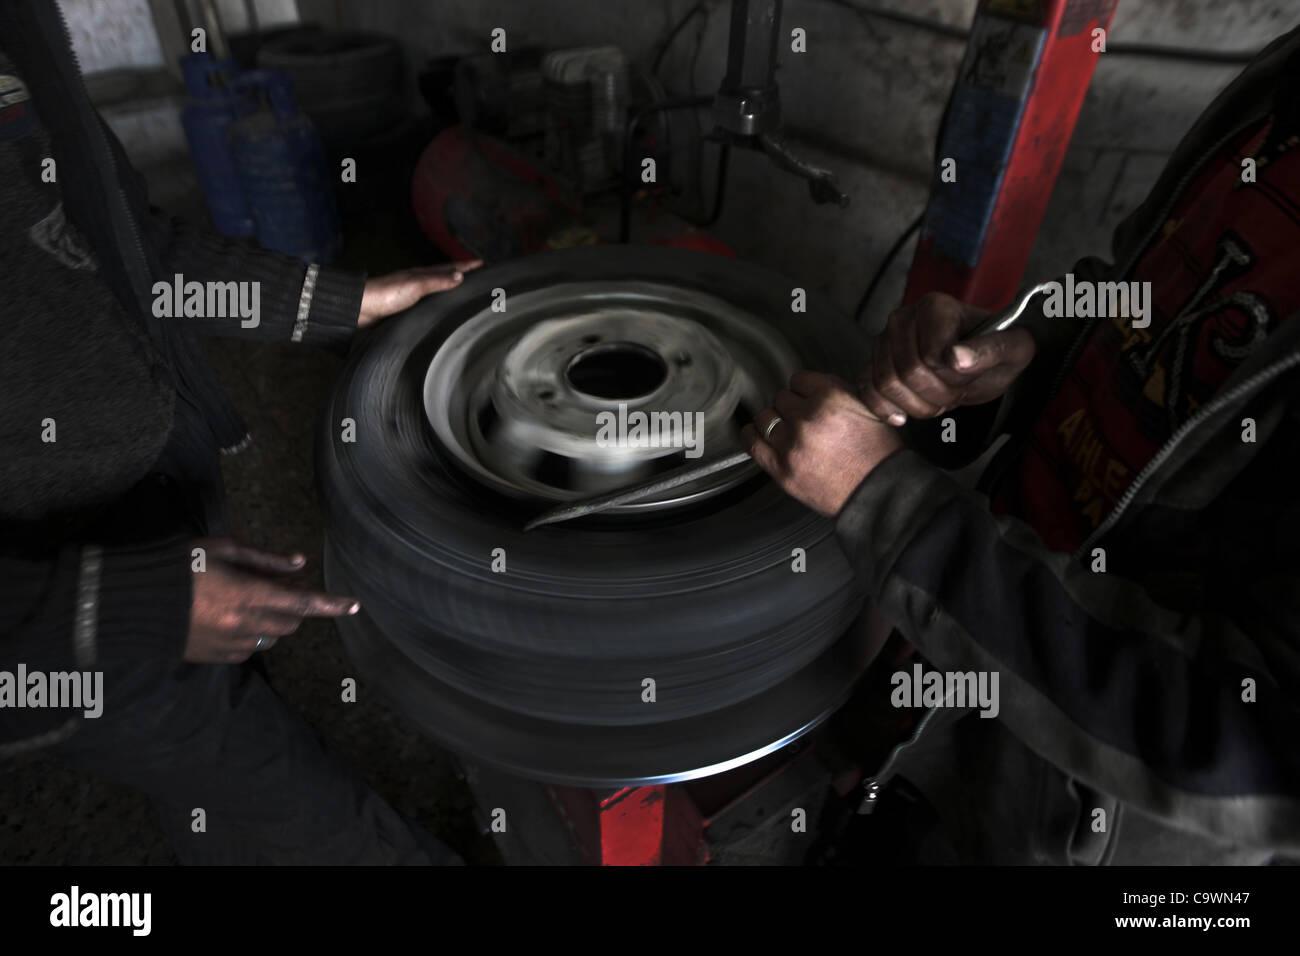 Feb. 23, 2012 - Gaza City, Gaza Strip, Palestinian Territory - Palestinian children work repairing a car tyre in - Stock Image